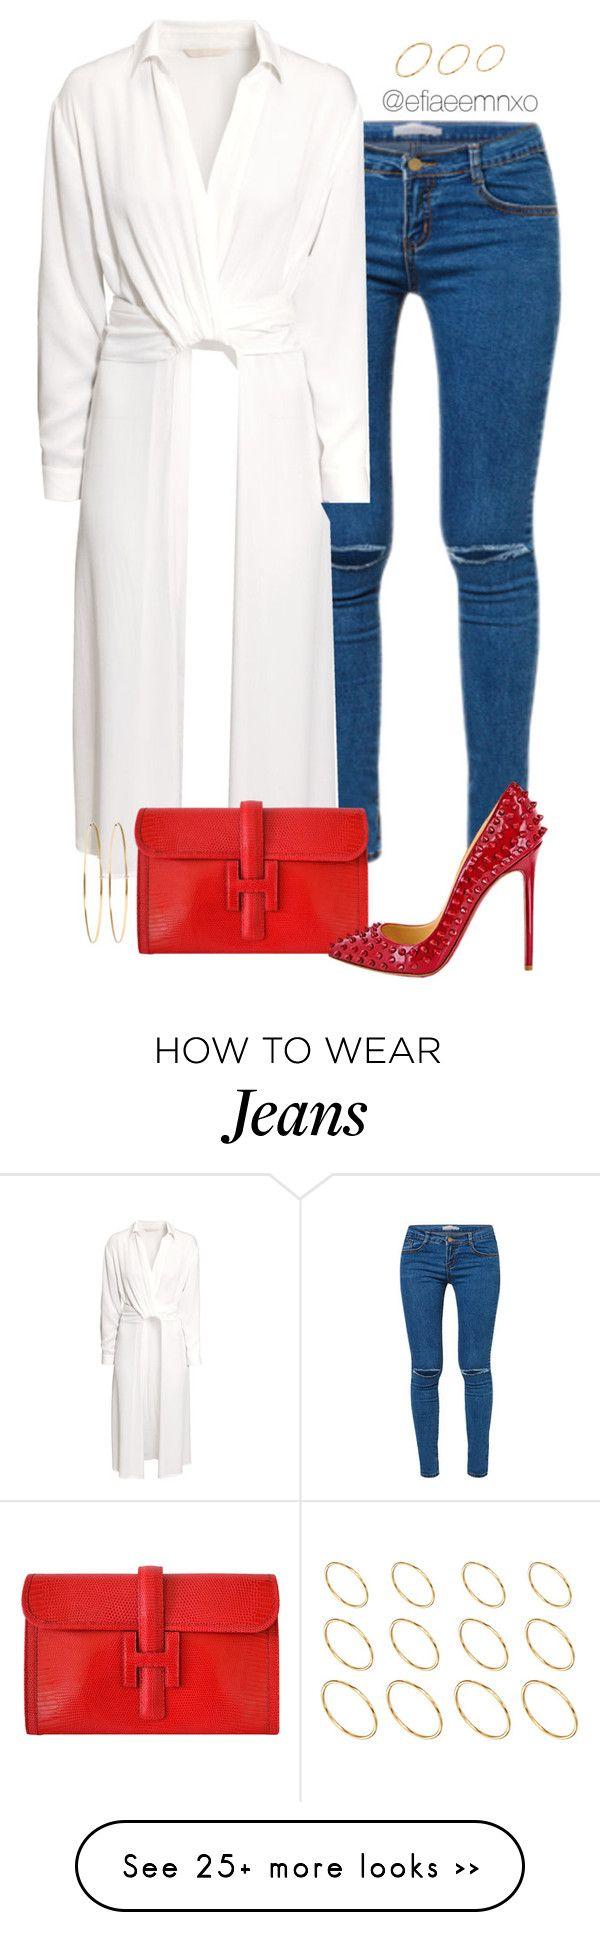 """She's a fashion killa"" by efiaeemnxo on Polyvore featuring H&M, Hermès, Christian Louboutin, Jennifer Meyer Jewelry and ASOS"